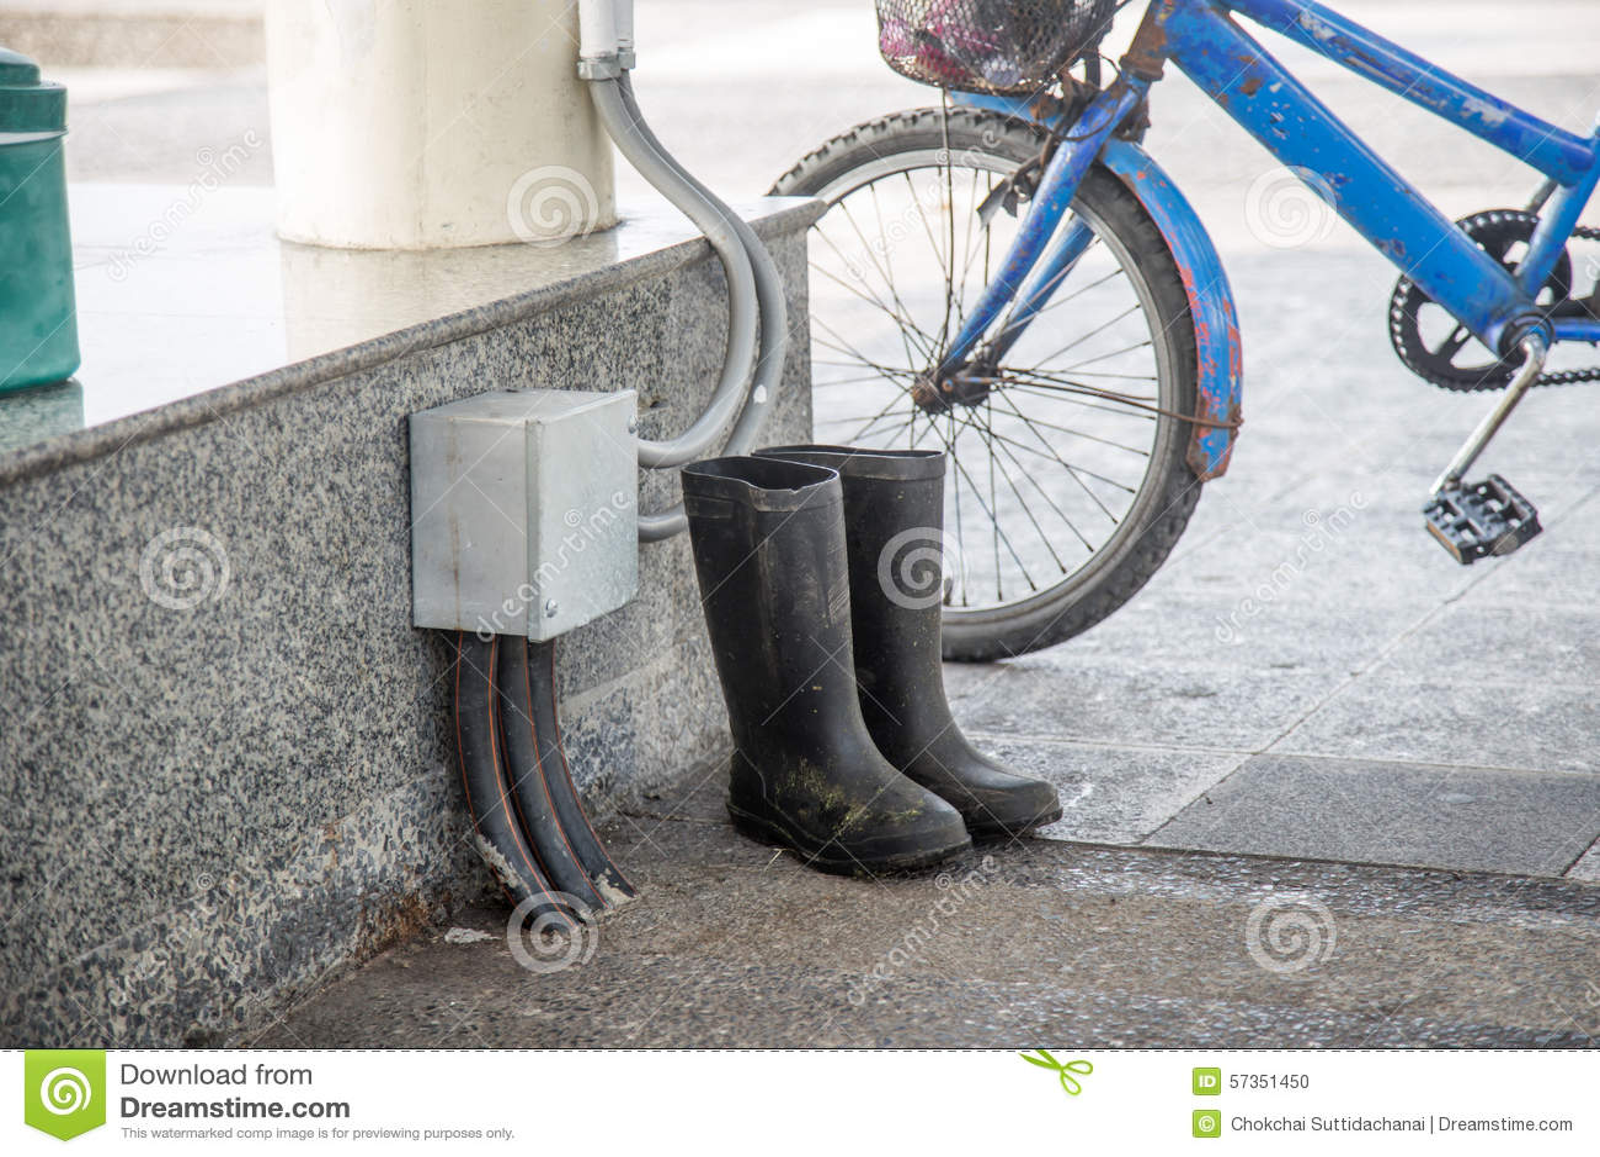 Fahrrad Gummistiefel Stockfoto Bild Altem Neben Schmutzige DHWYE9eI2